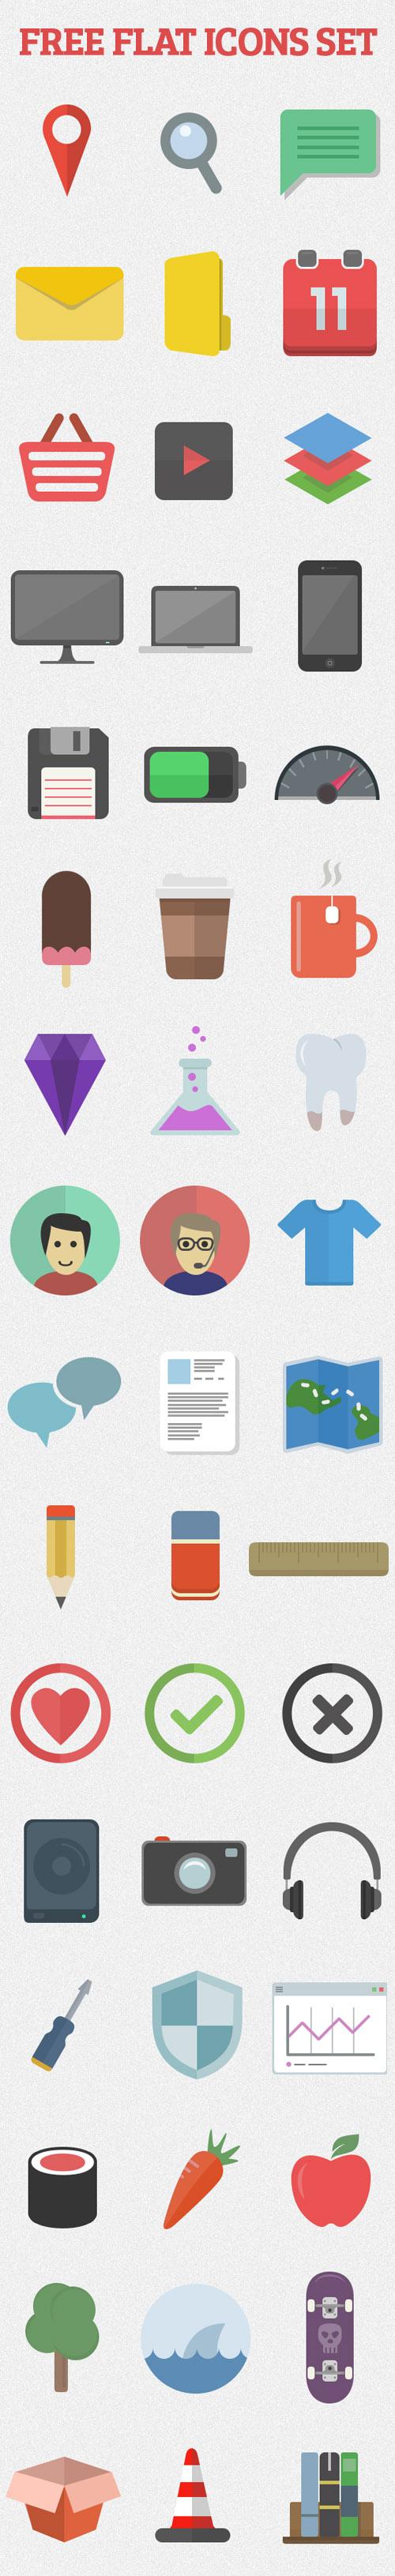 Flat Elements for Web UI Design-43